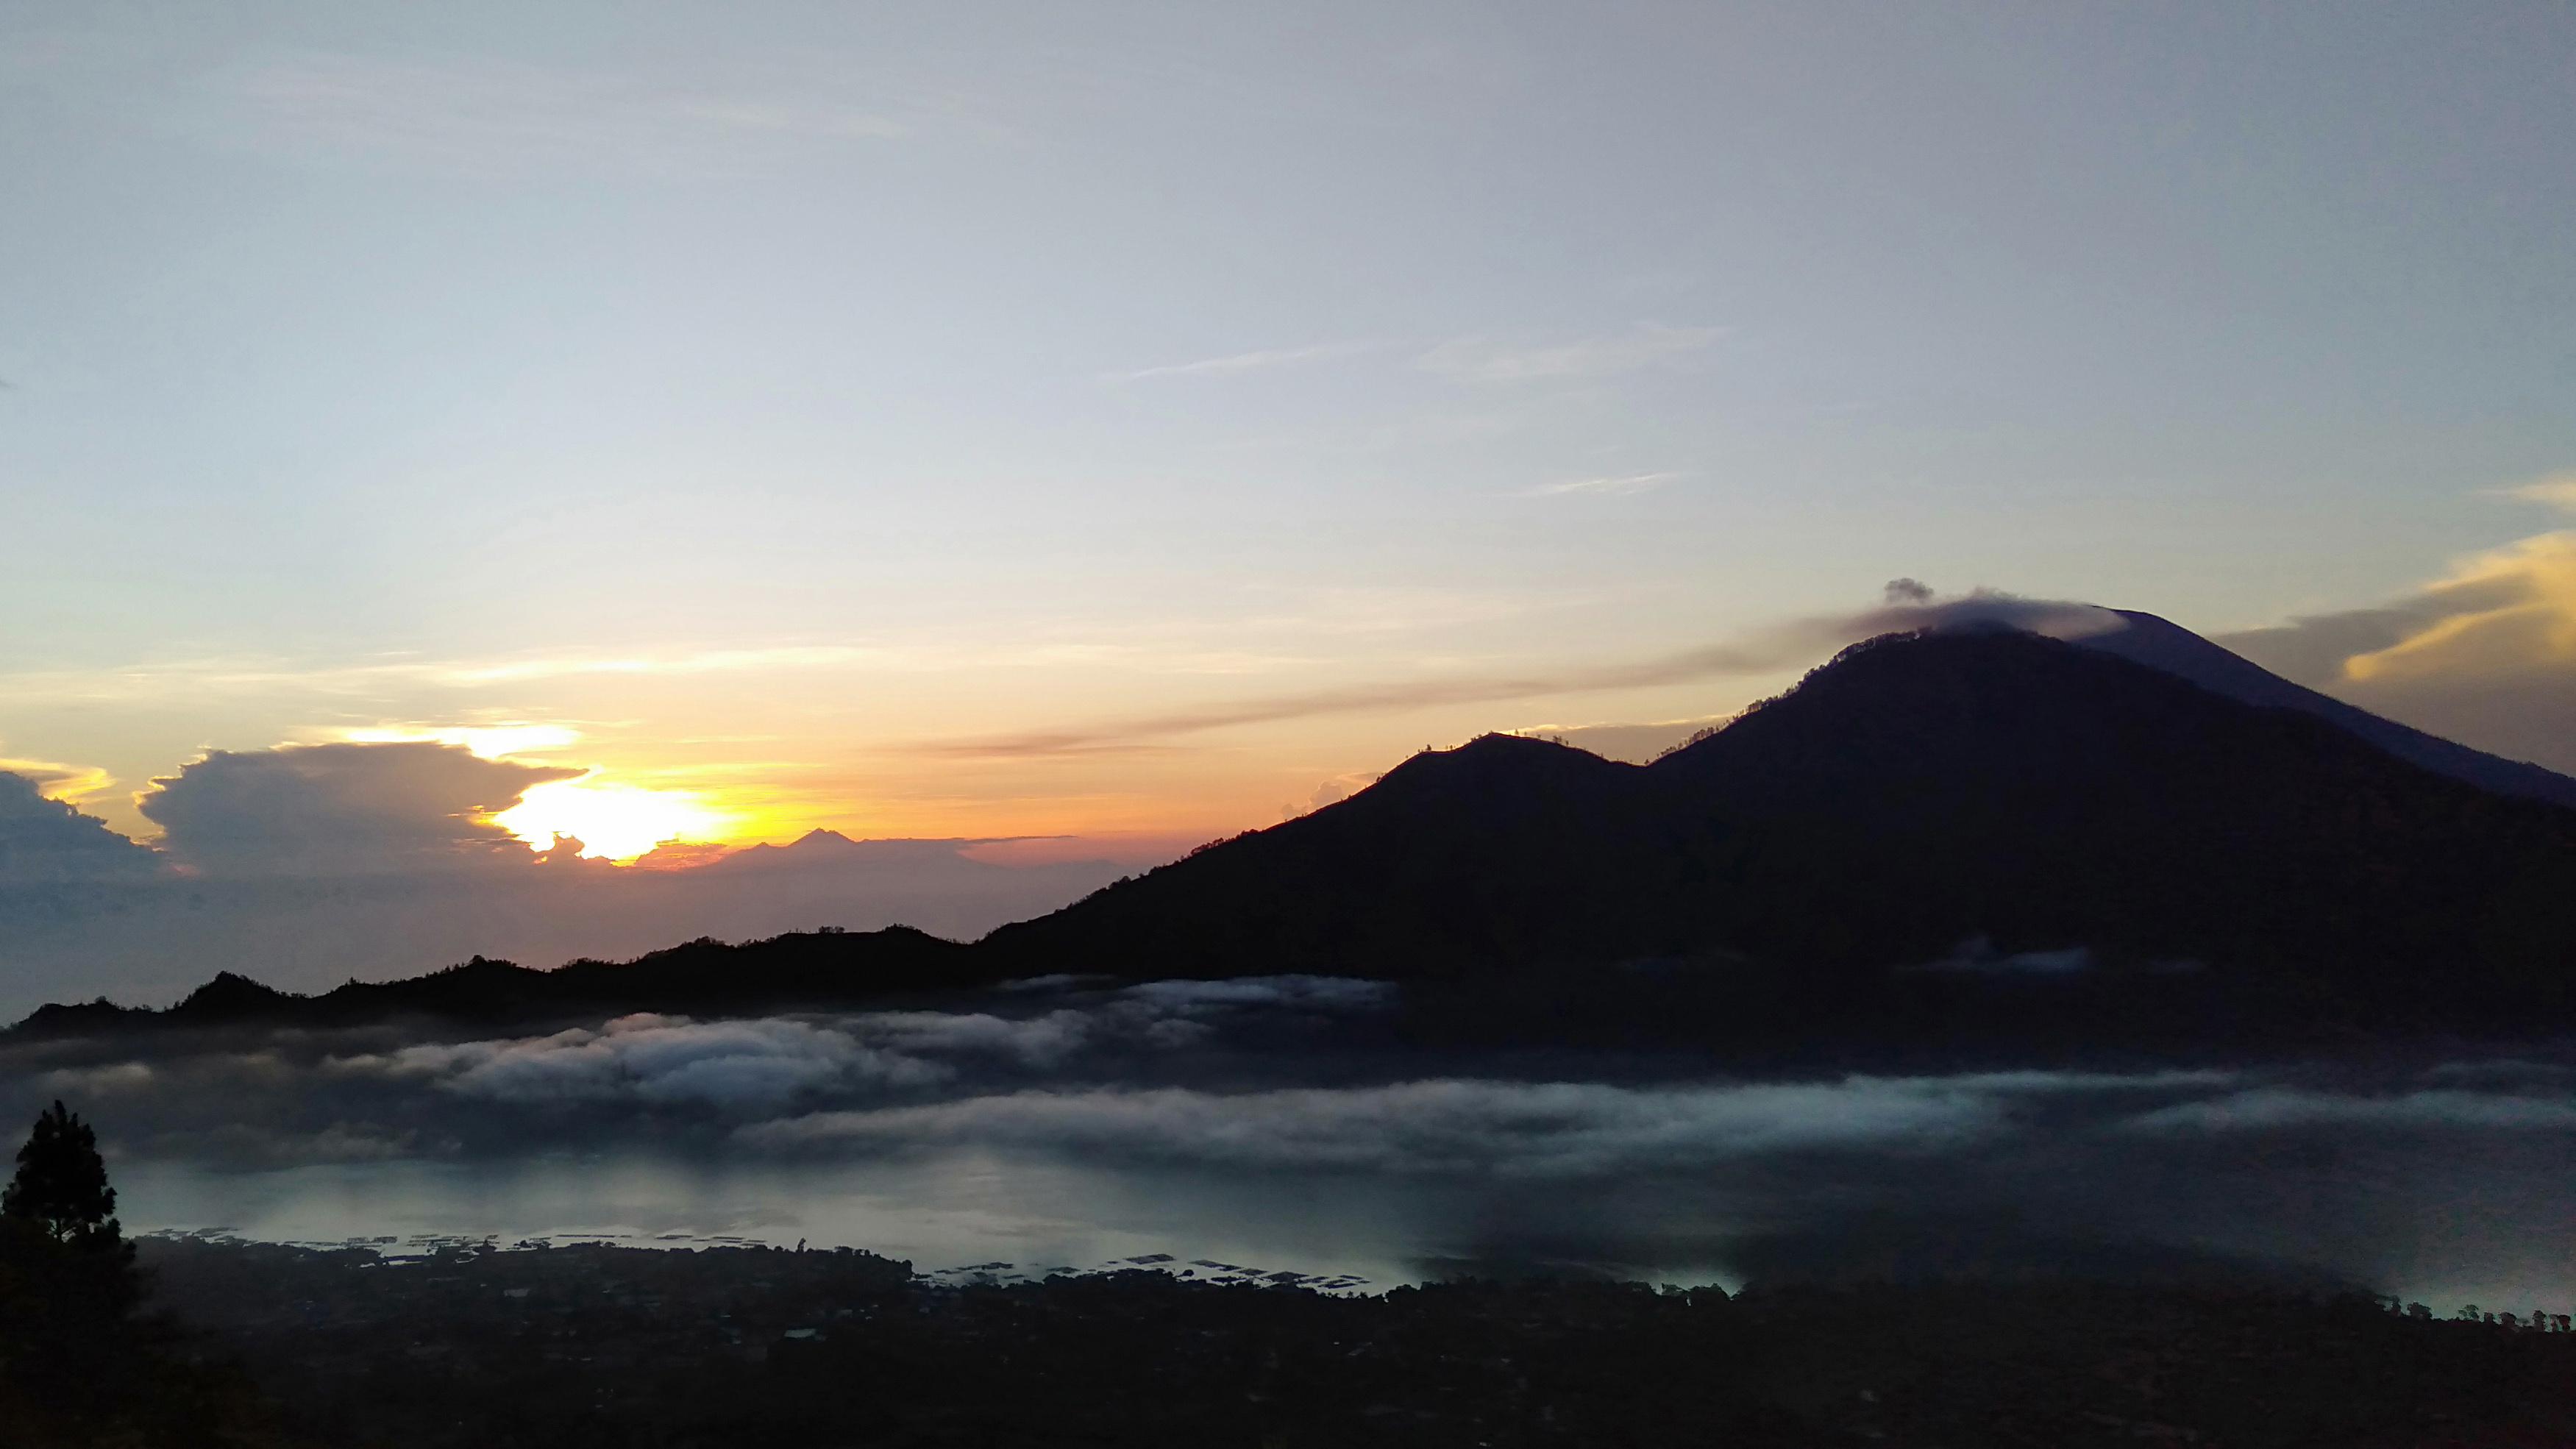 A scenic view